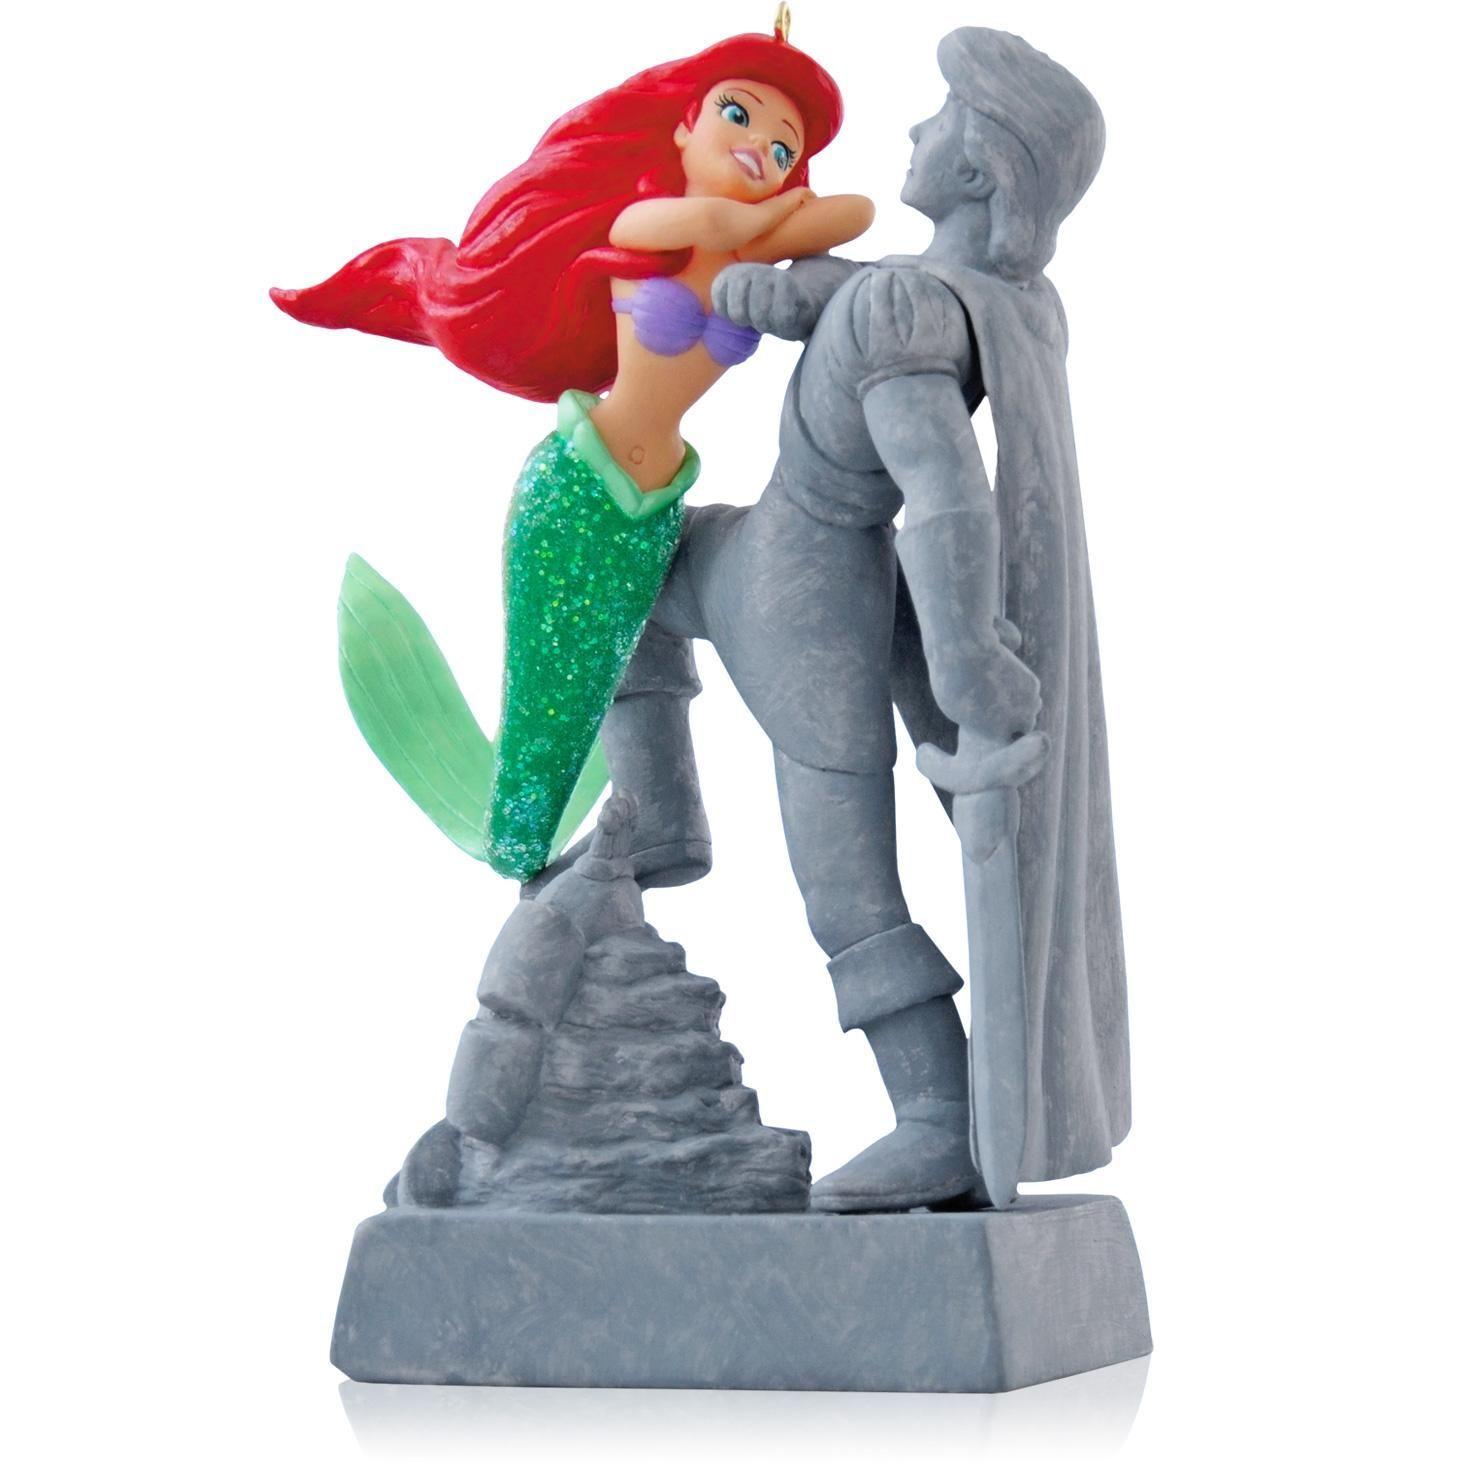 disney the little mermaid christmas ornaments hallmark - Little Mermaid Christmas Ornaments